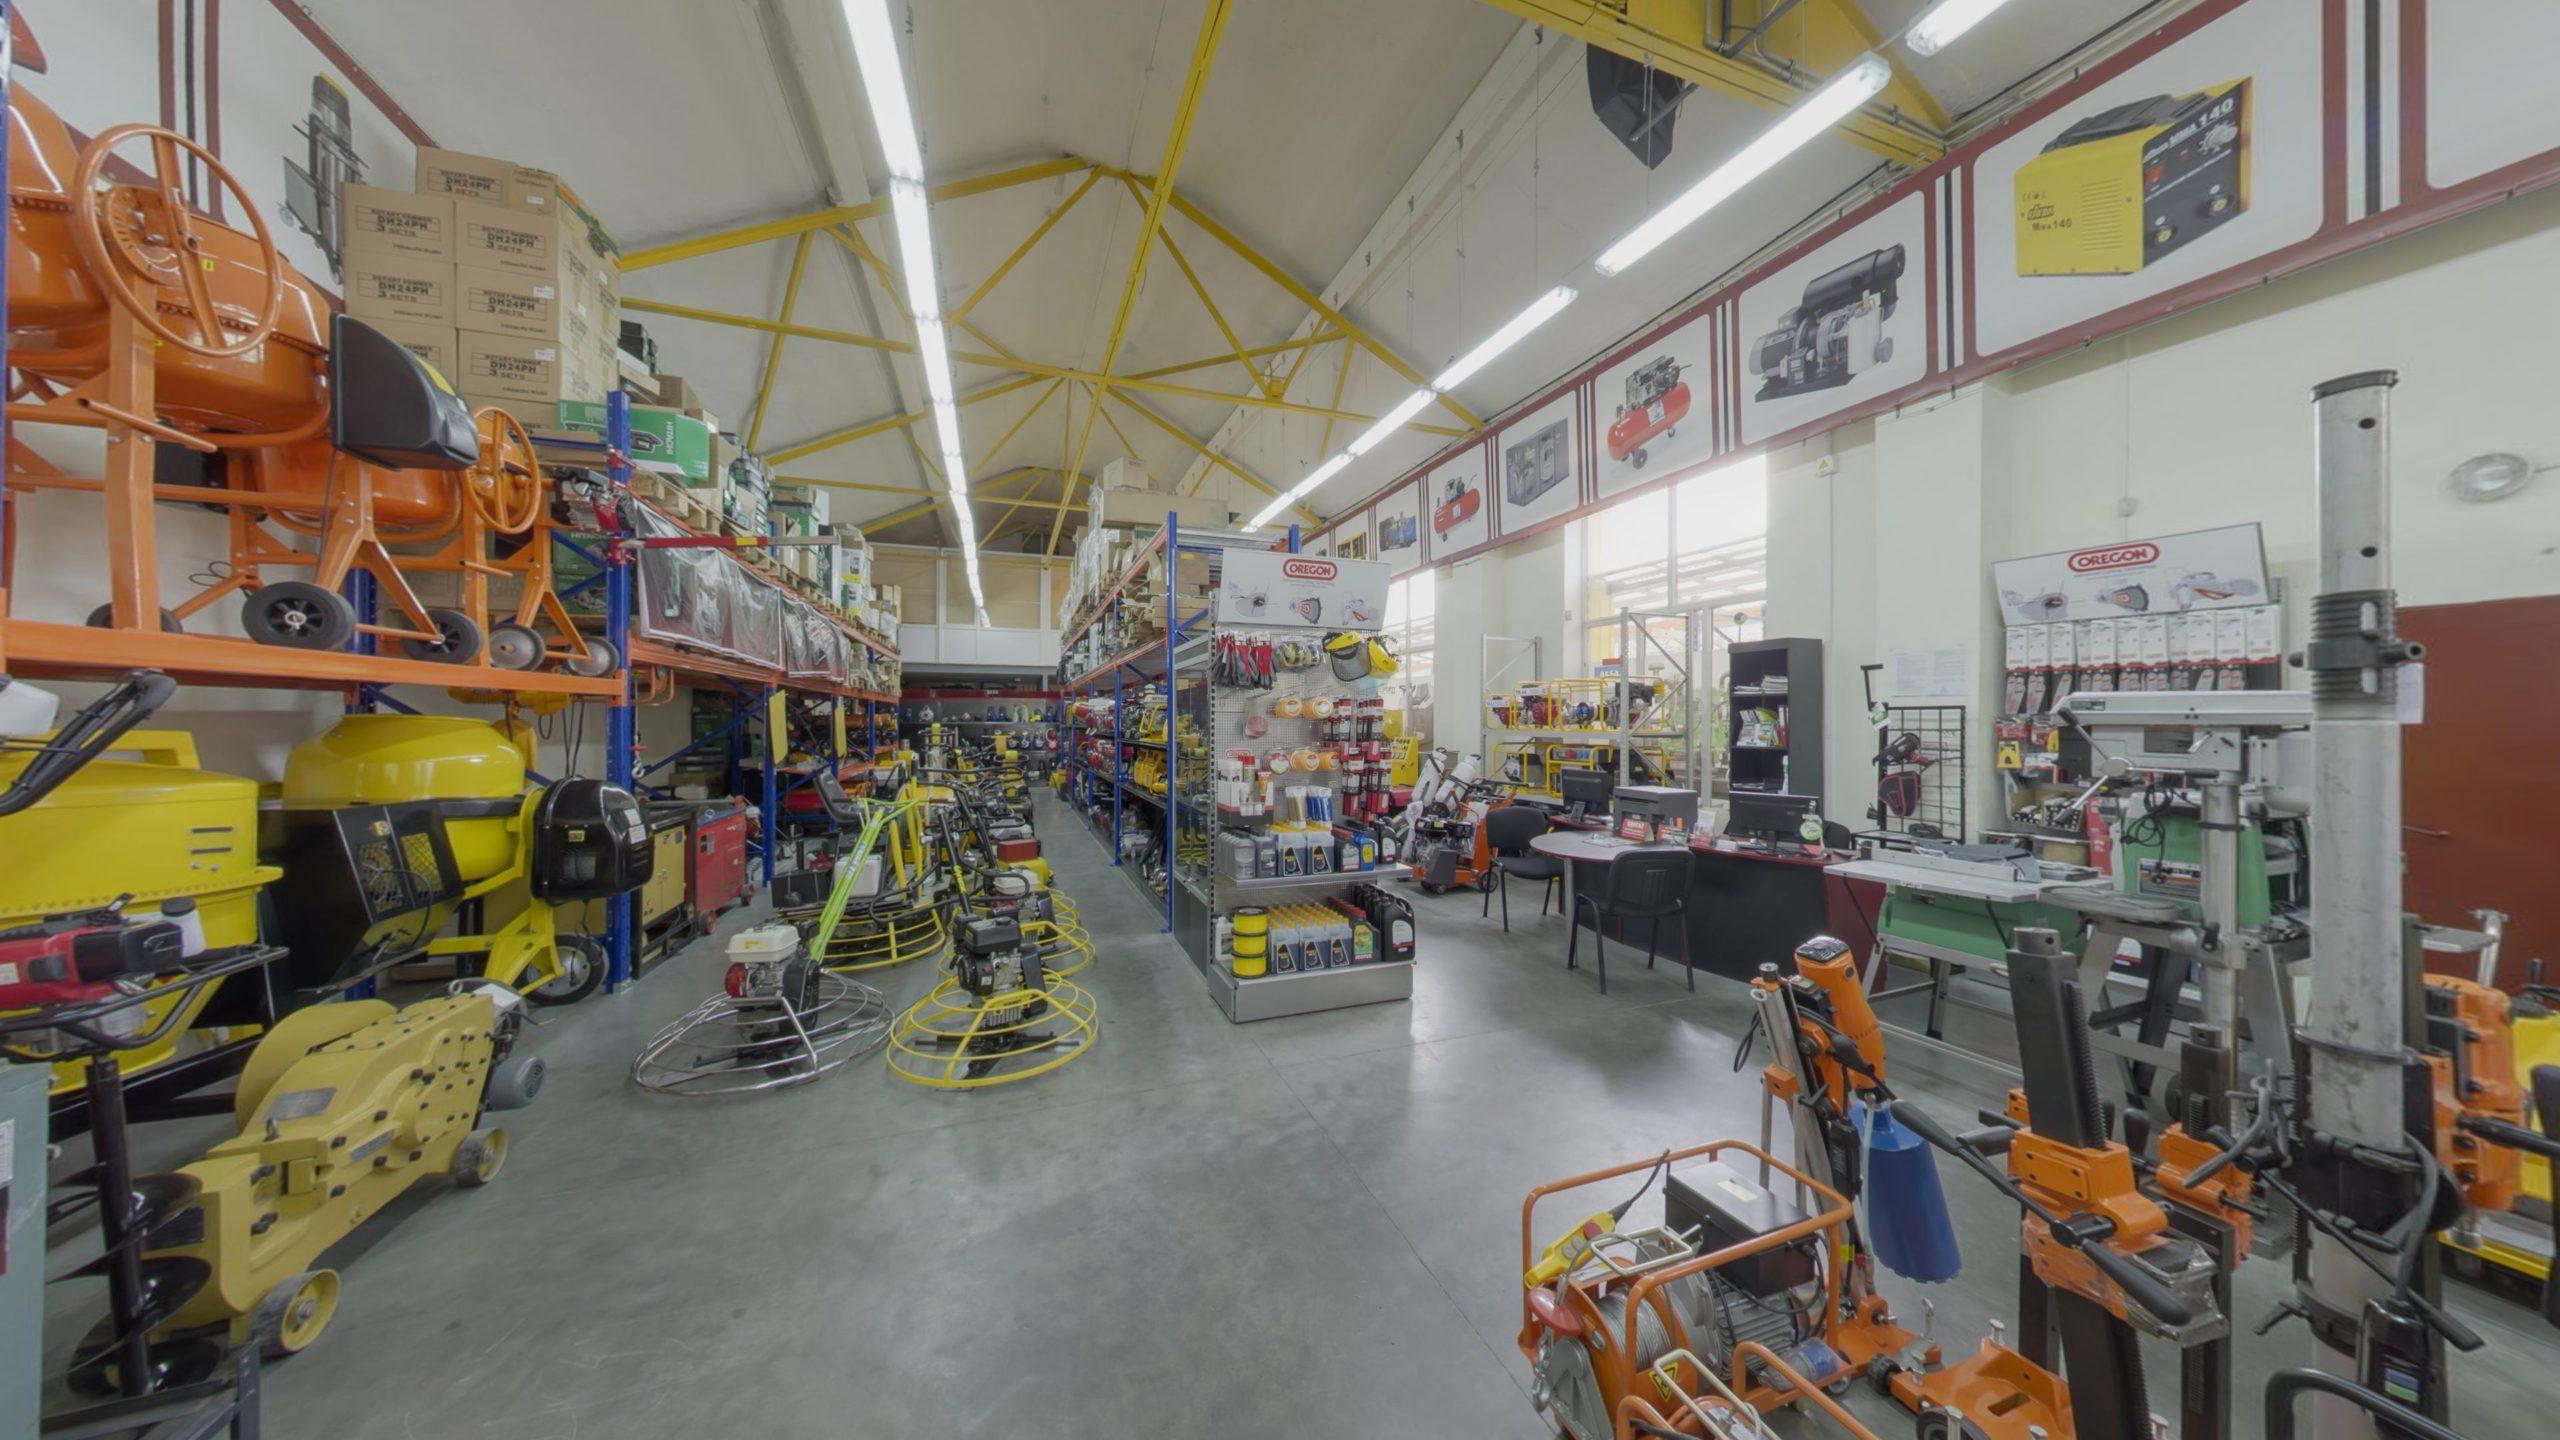 Virtual Tour of the Stroy-Tech Store, Kaliningrad, Russia. Stroytekh: compressors, generators, loaders, racks, power tools in Kaliningrad.